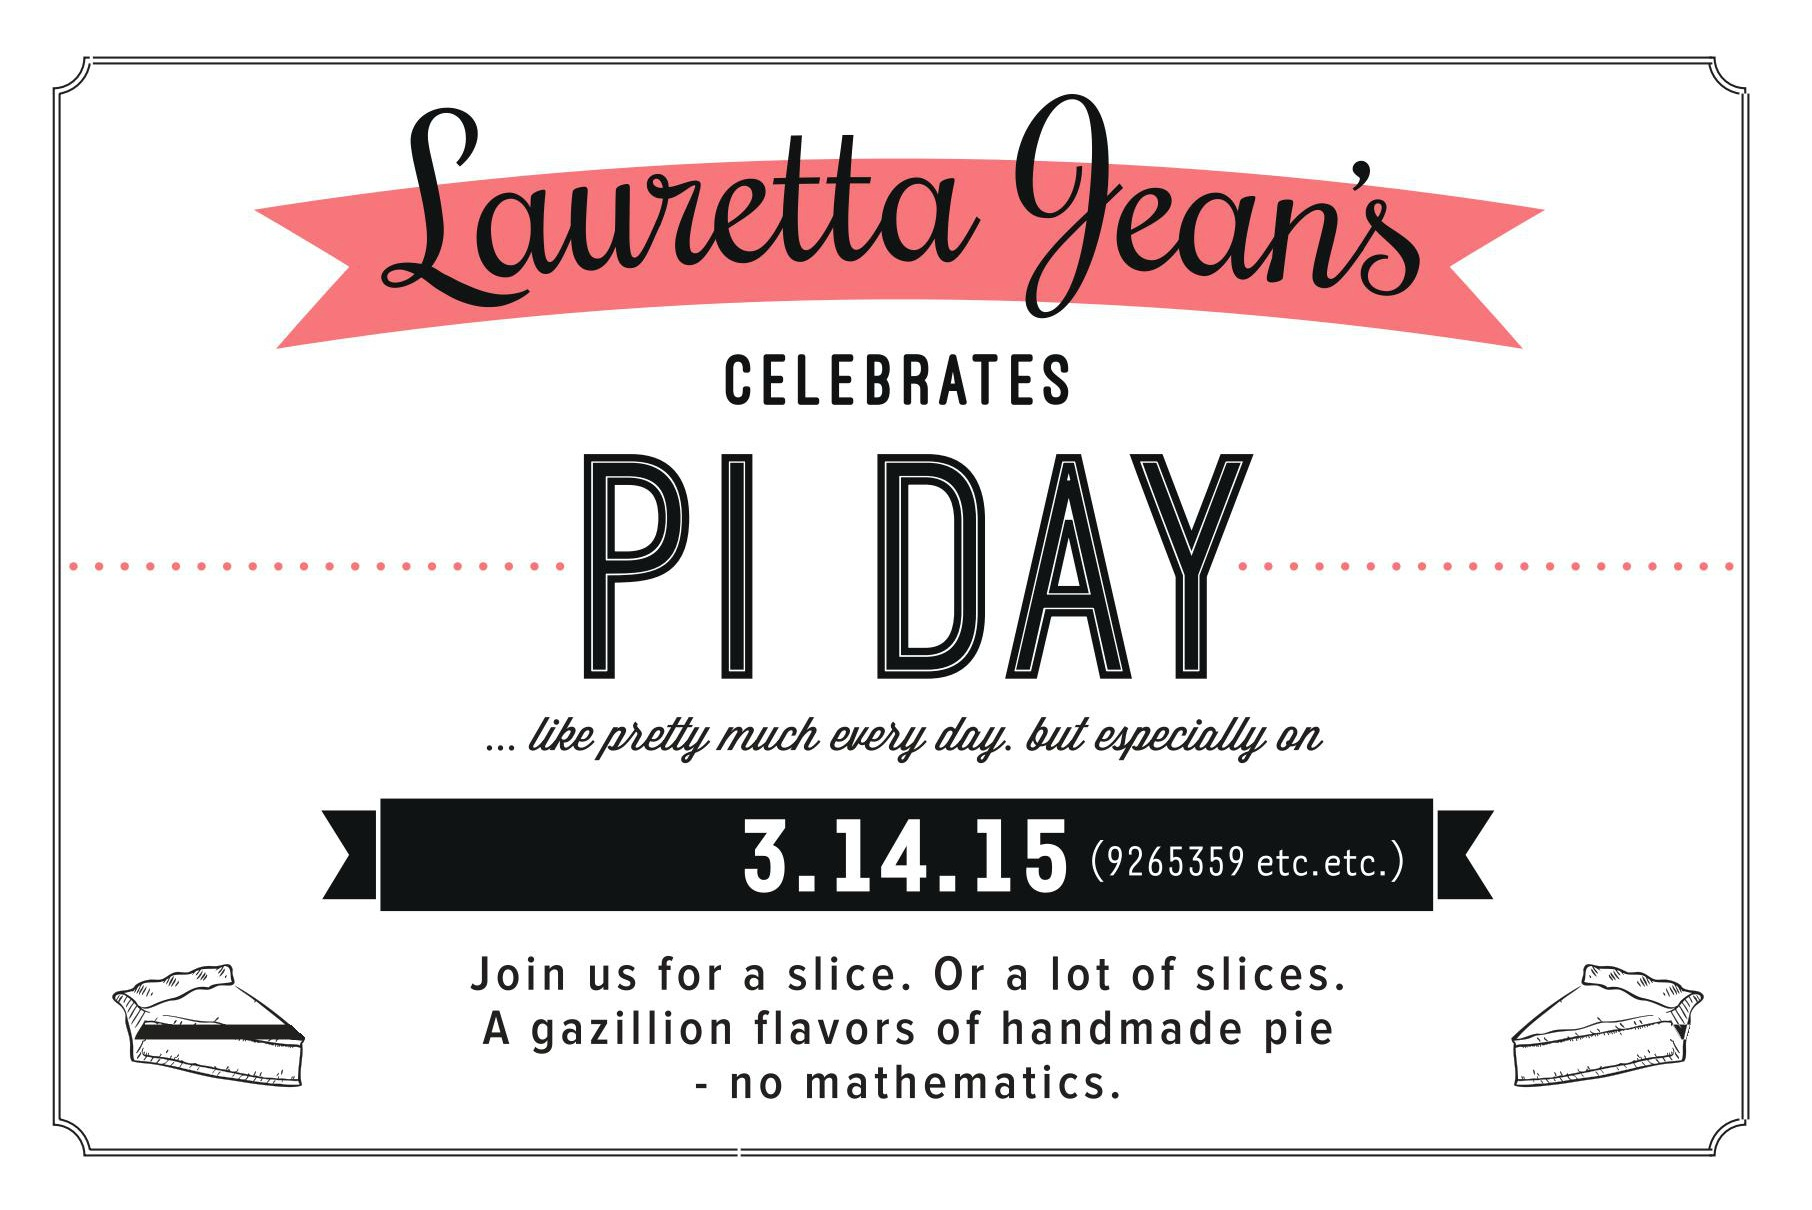 Pi Day at Lauretta Jean's